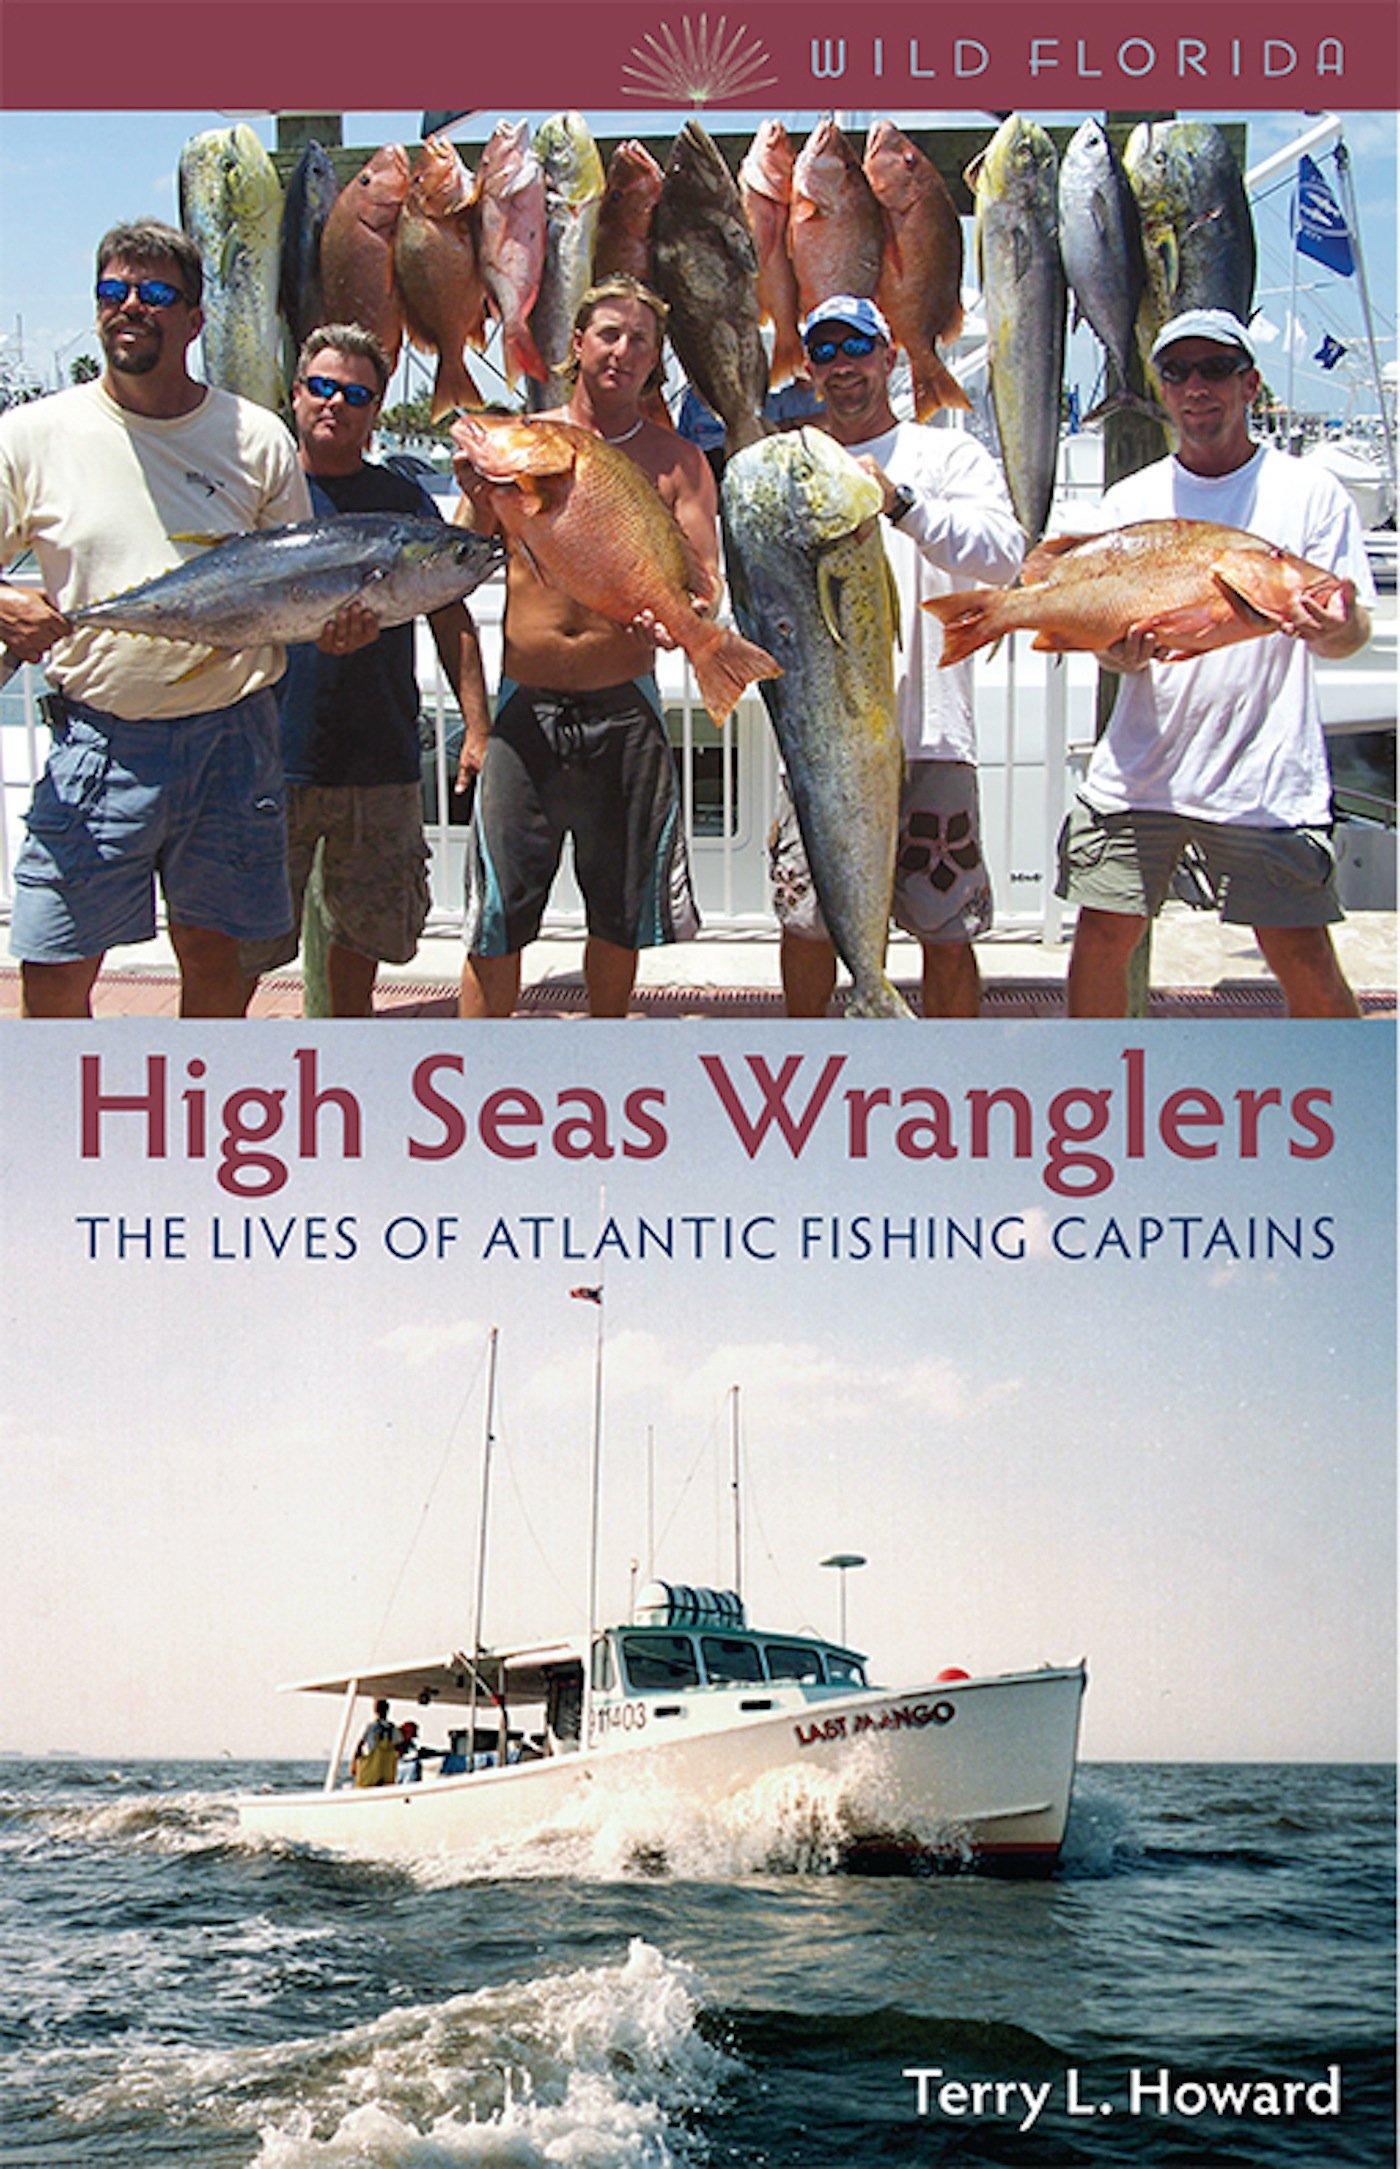 Download High Seas Wranglers: The Lives of Atlantic Fishing Captains (Wild Florida) pdf epub